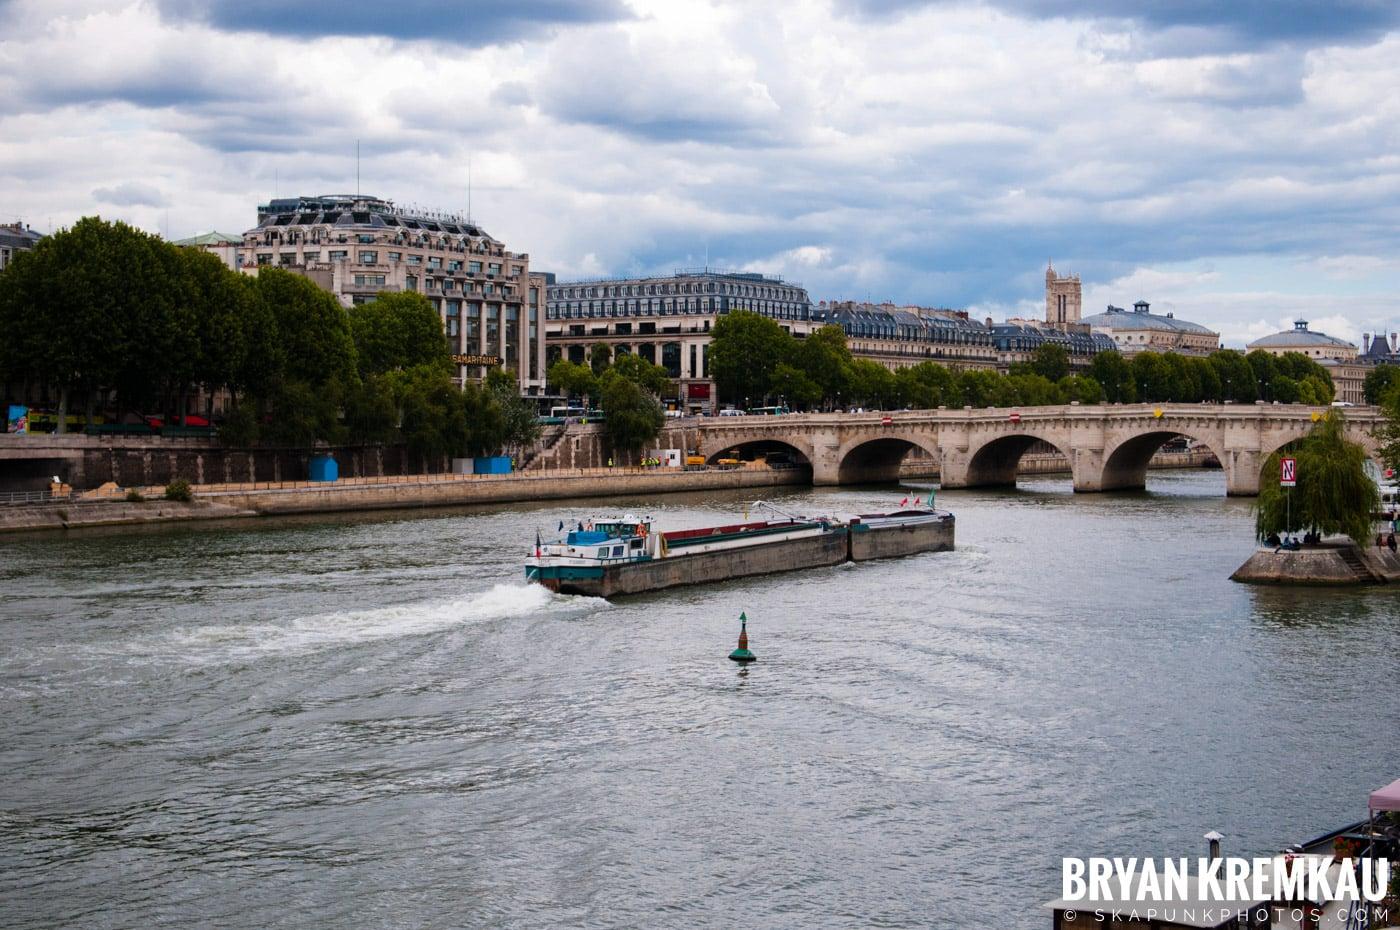 Paris, France Honeymoon - Day 1 - 7.18.11 (8)